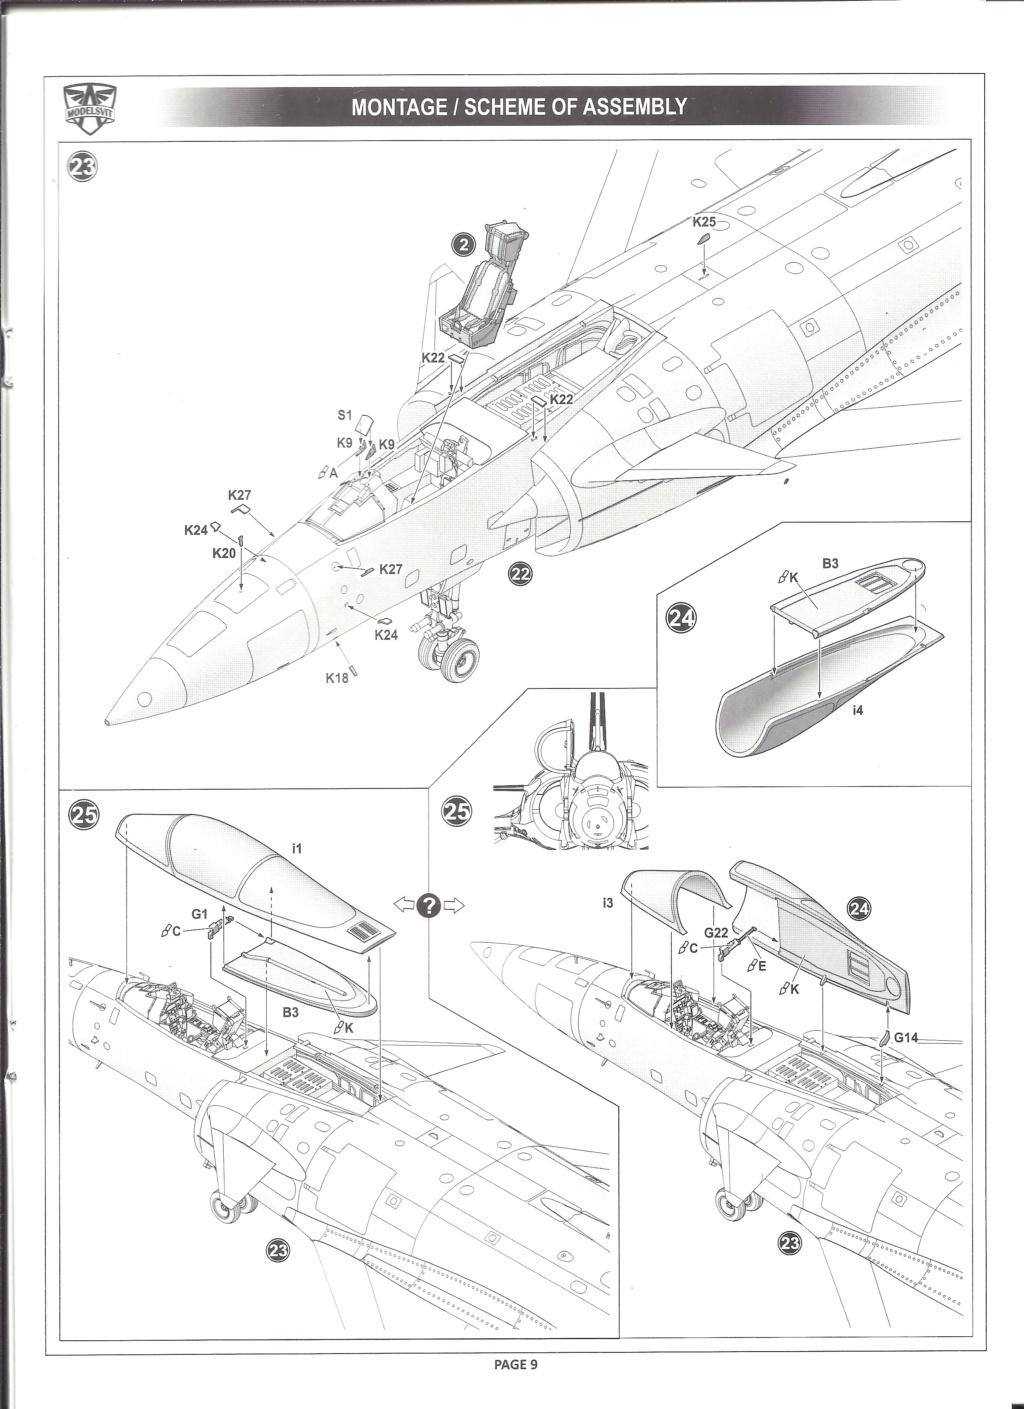 [MODELSVIT] DASSAULT MIRAGE 4000 1/72ème Réf 72052 Notice Models20